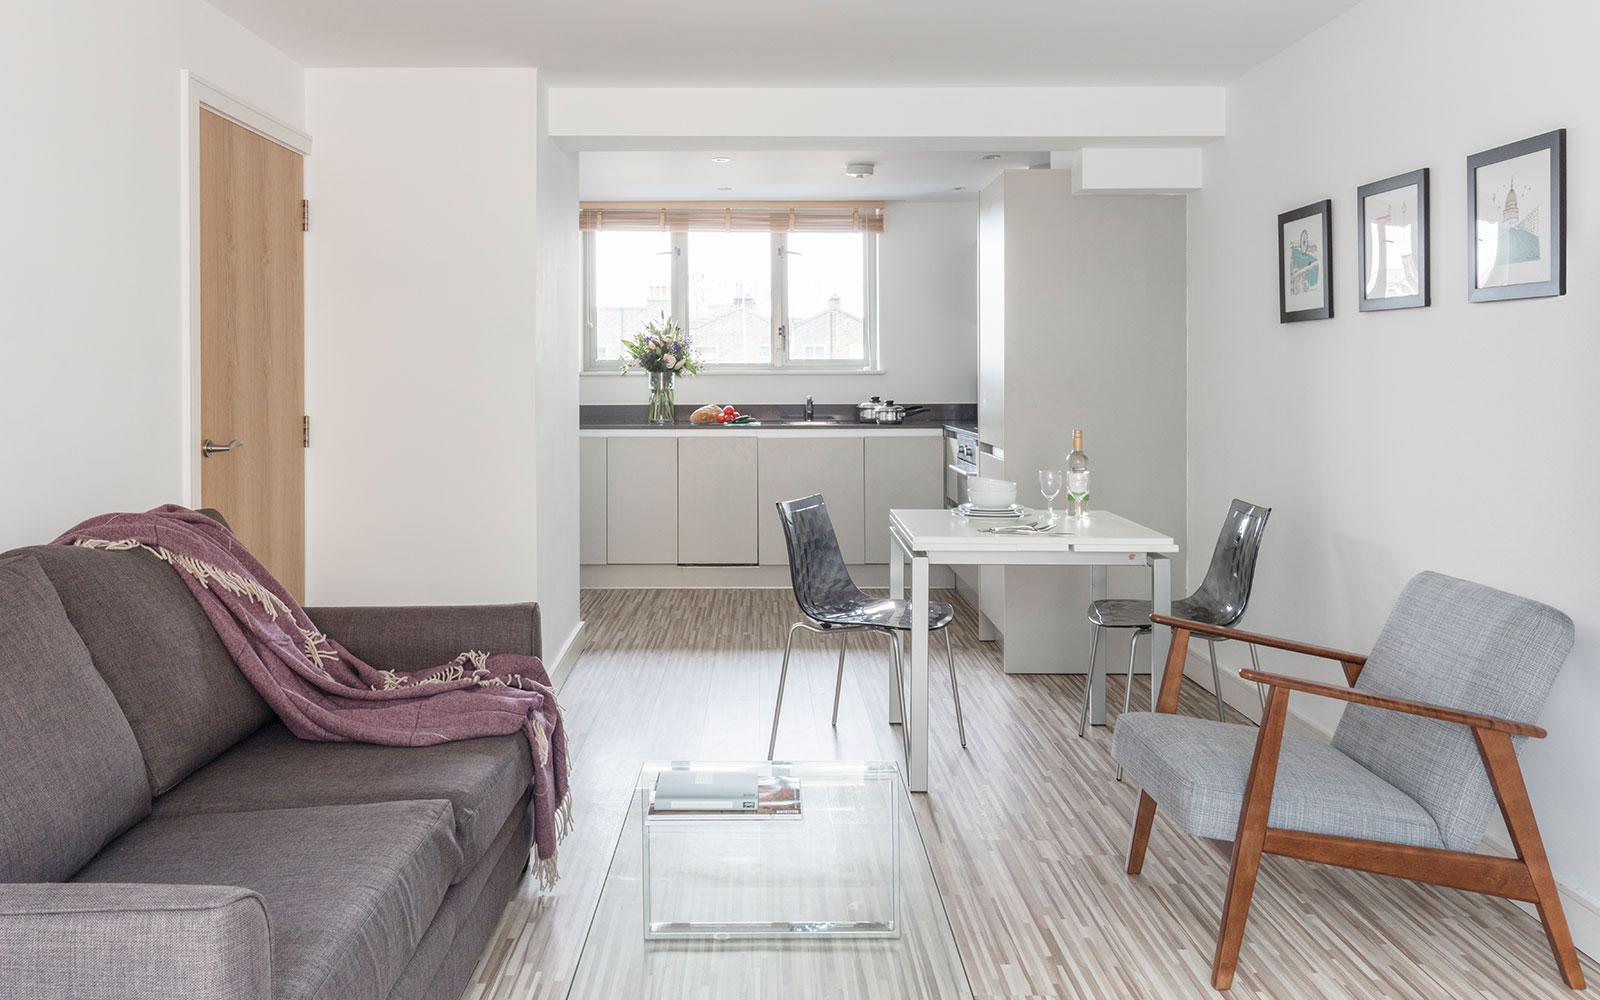 Serviced Apartments SACO Holborn Lambs Conduit St